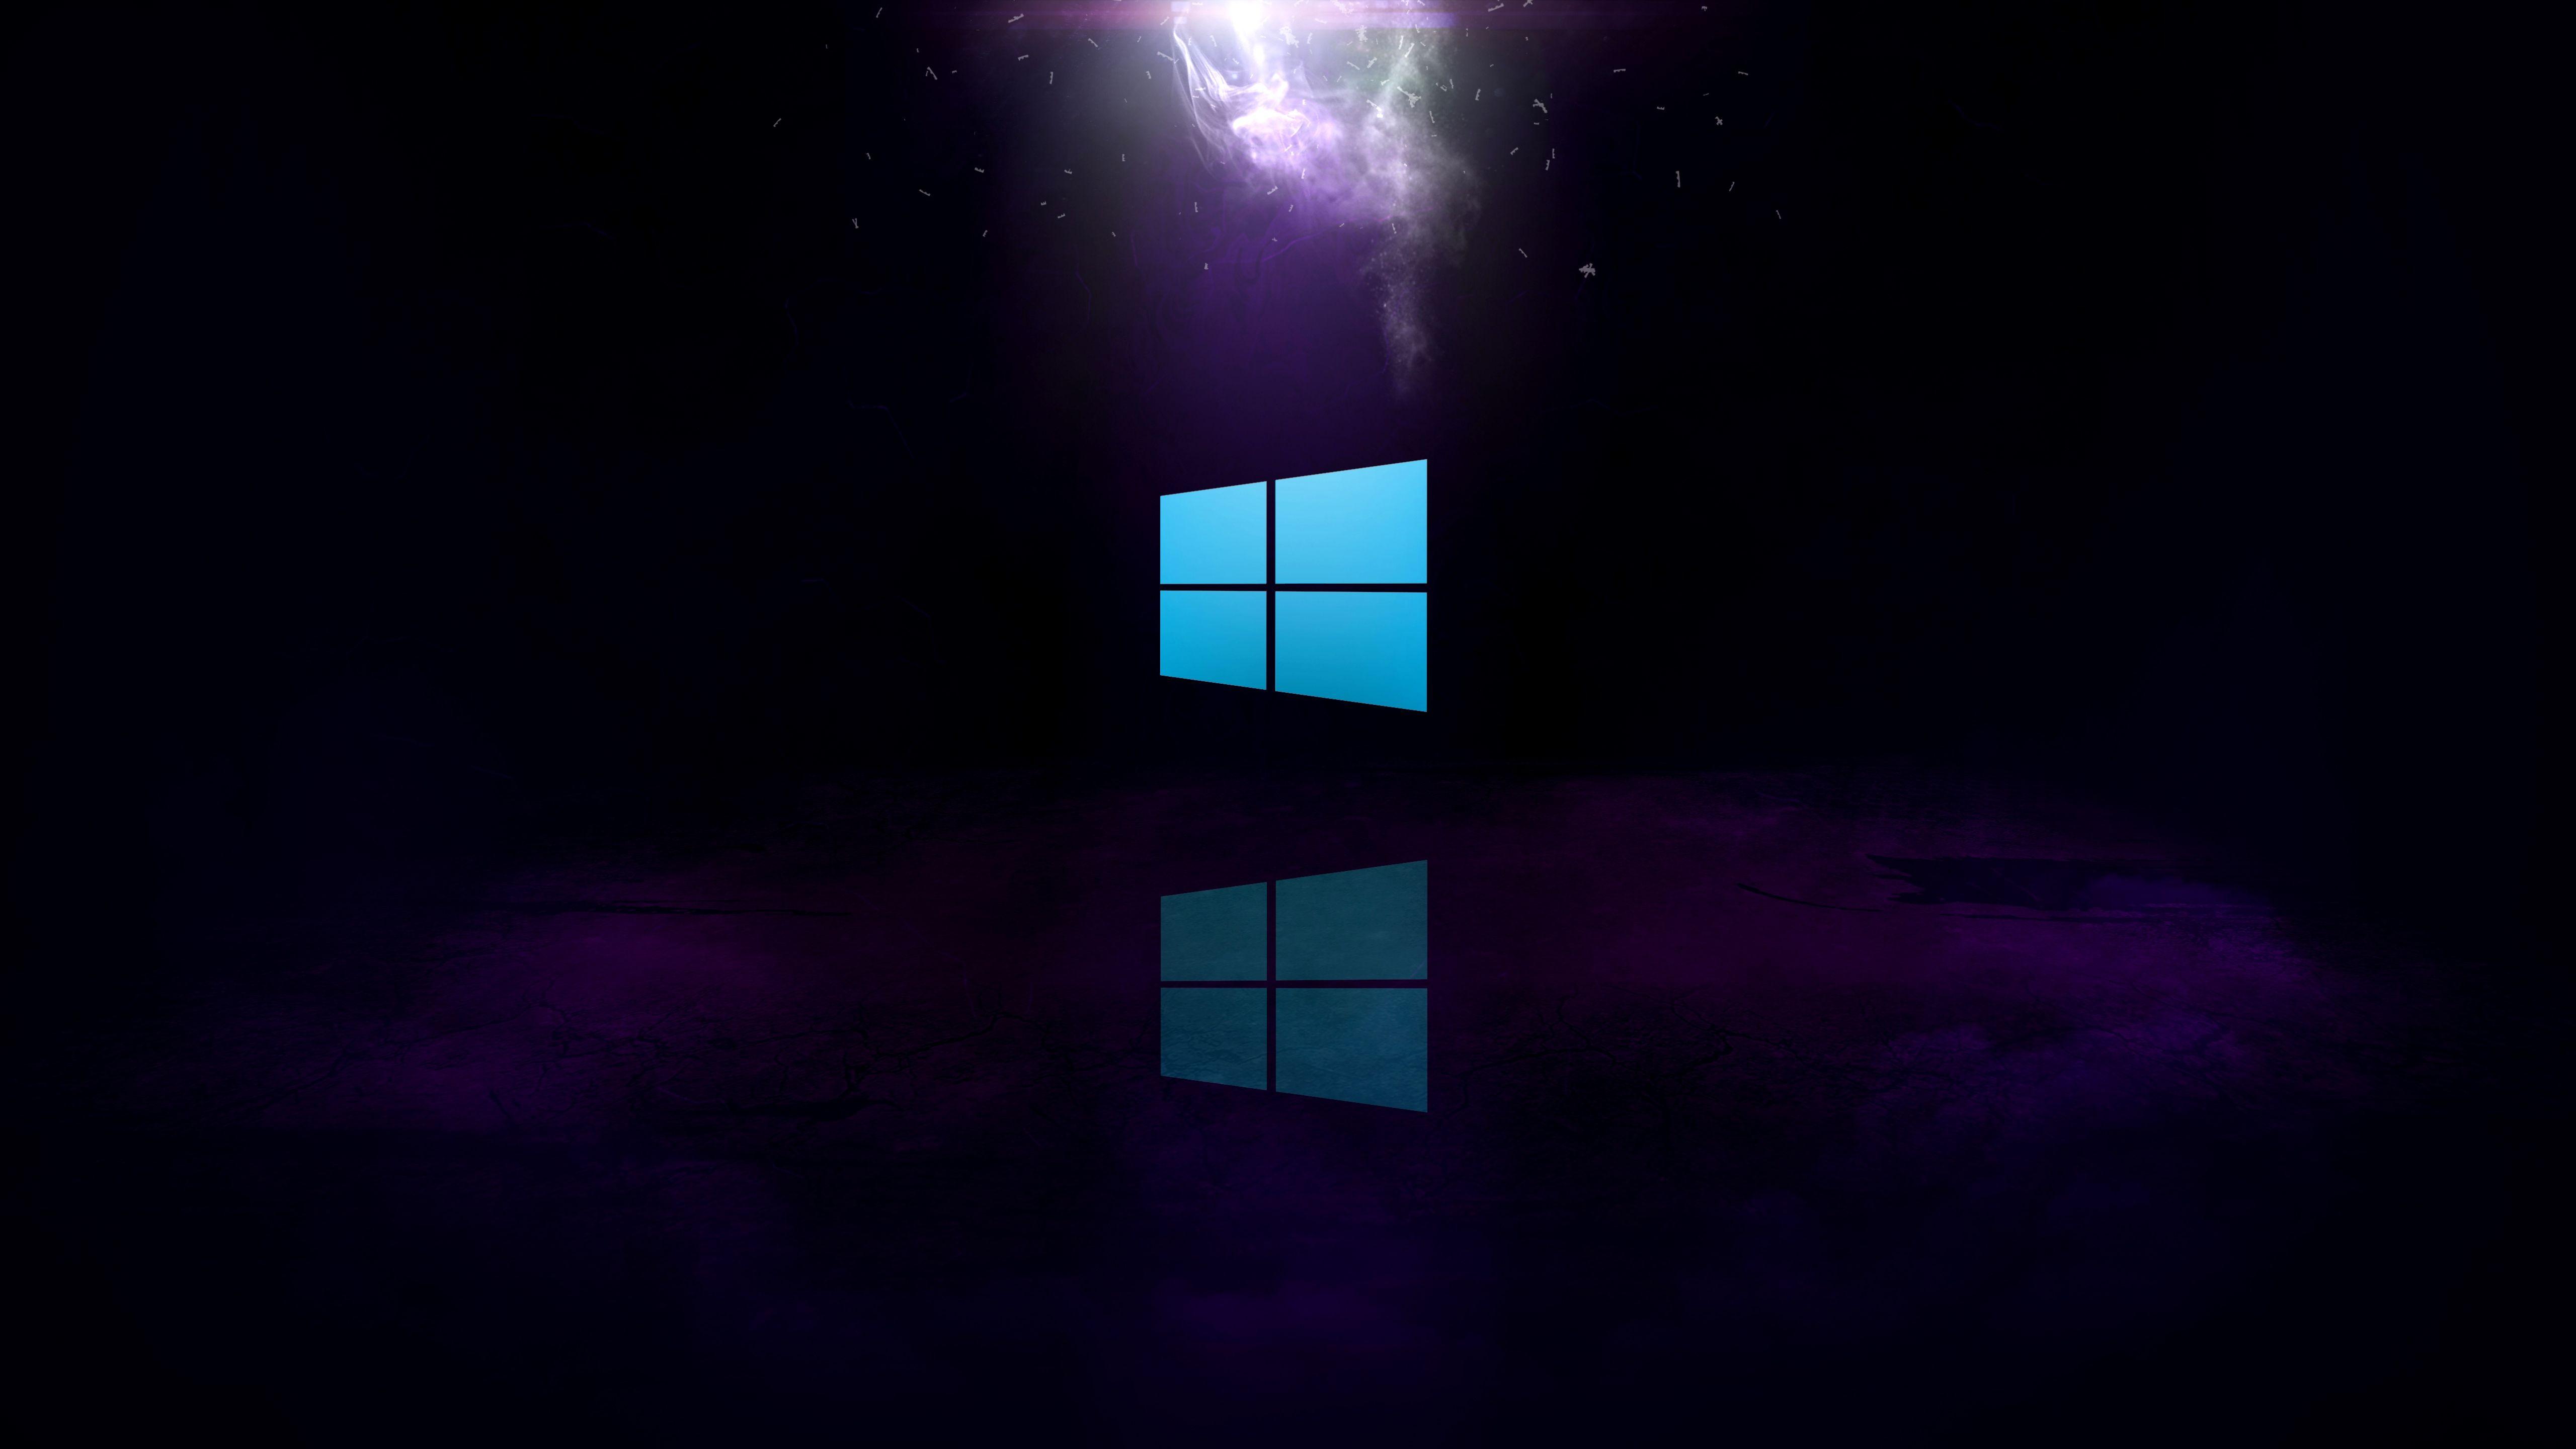 Wallpaper 4k Para Pc Windows 10 Ideas Di 2020 Windows 10 Windows Animasi